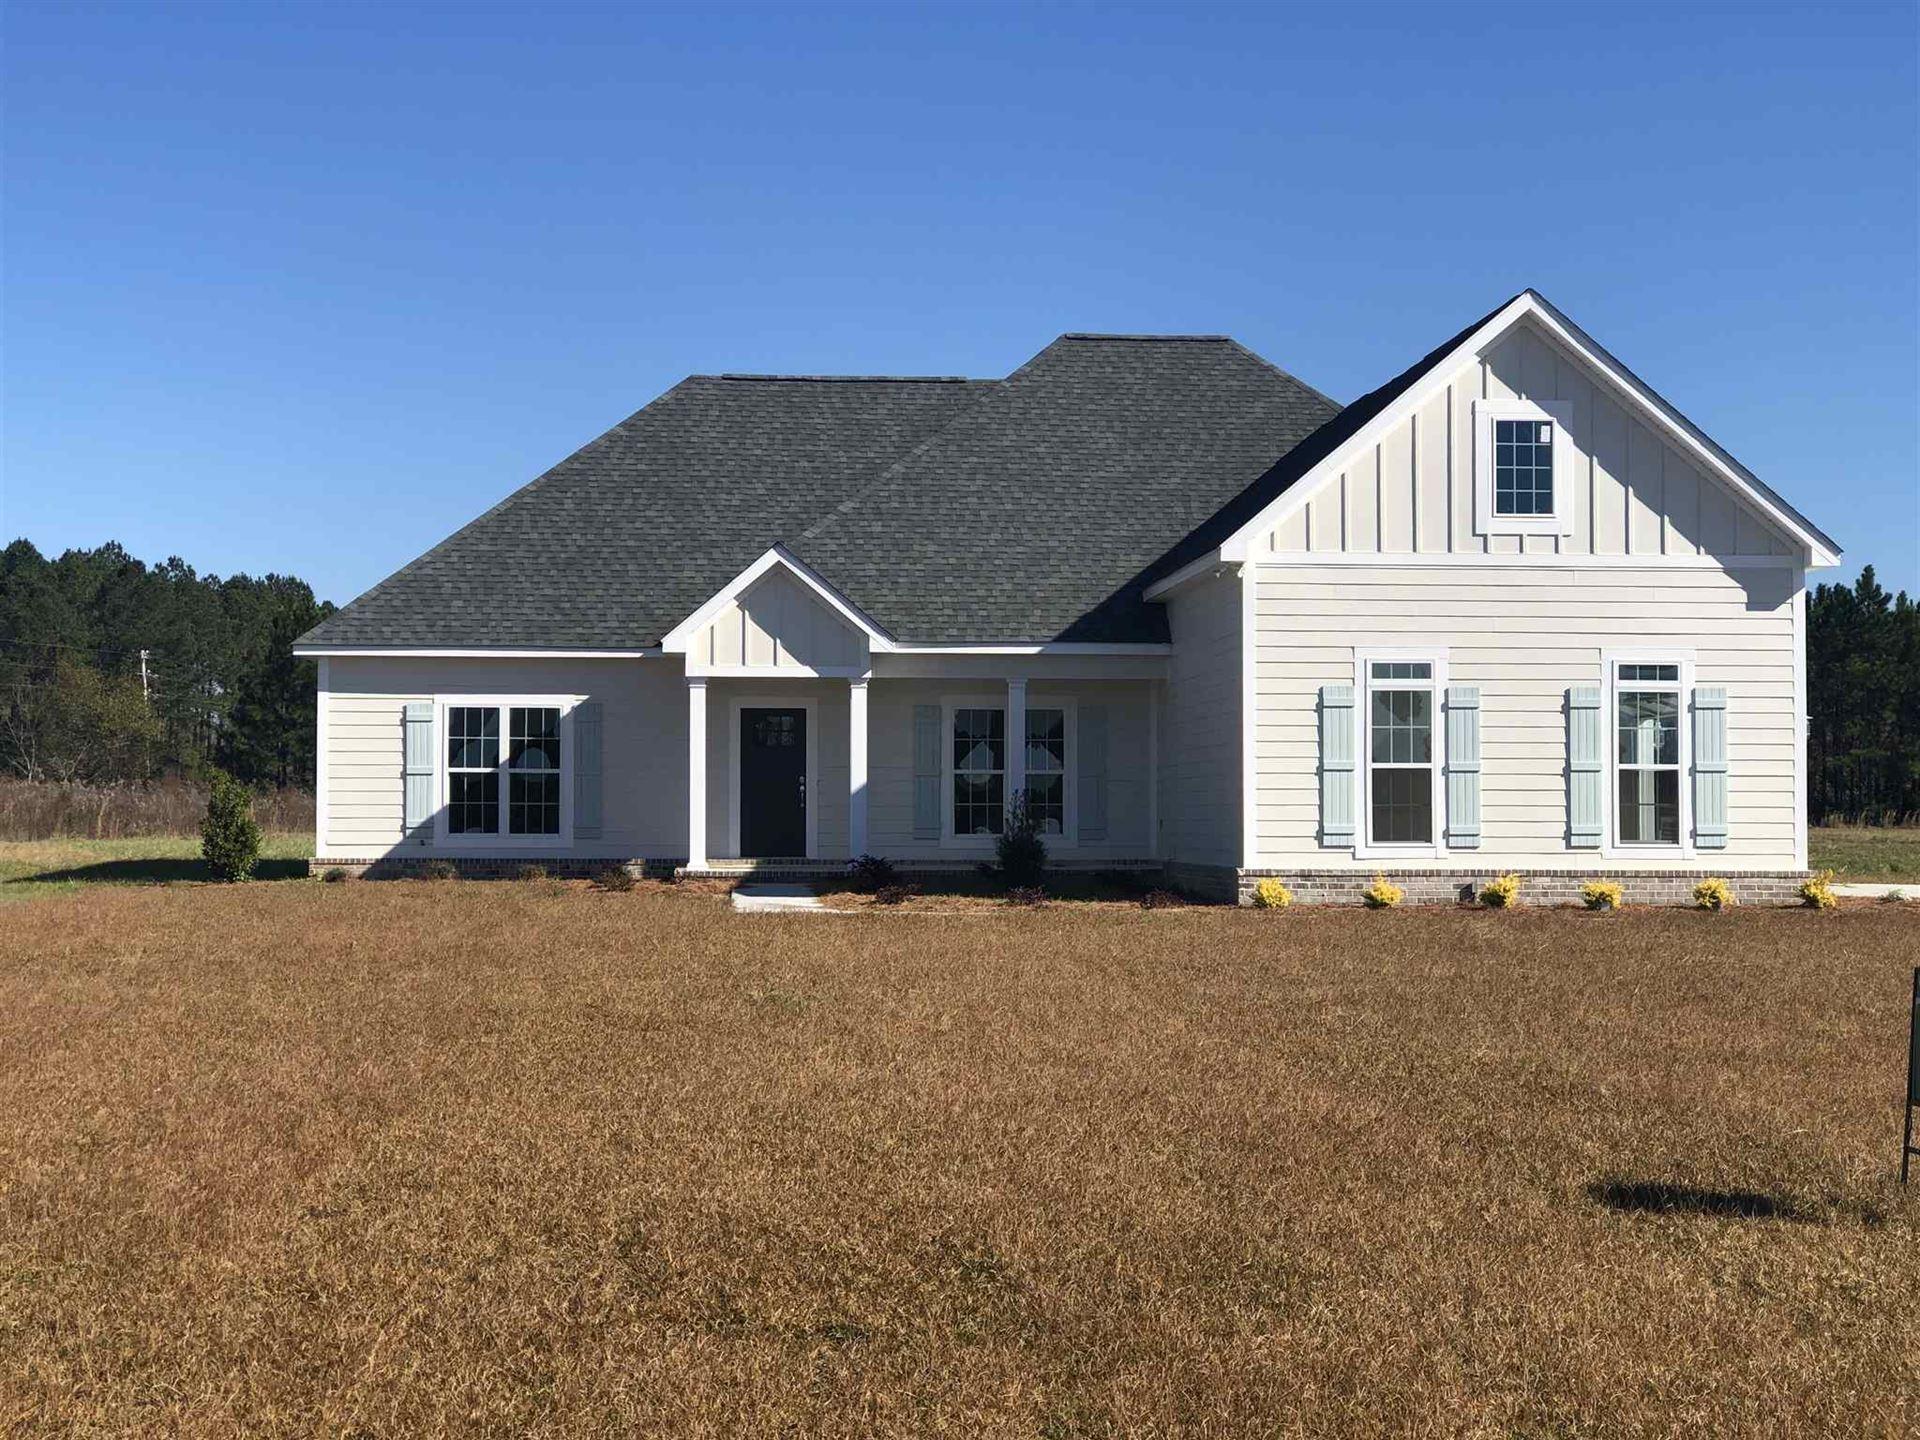 0 Windmill Plantation Dr, Statesboro, GA 30461 - MLS#: 8860481